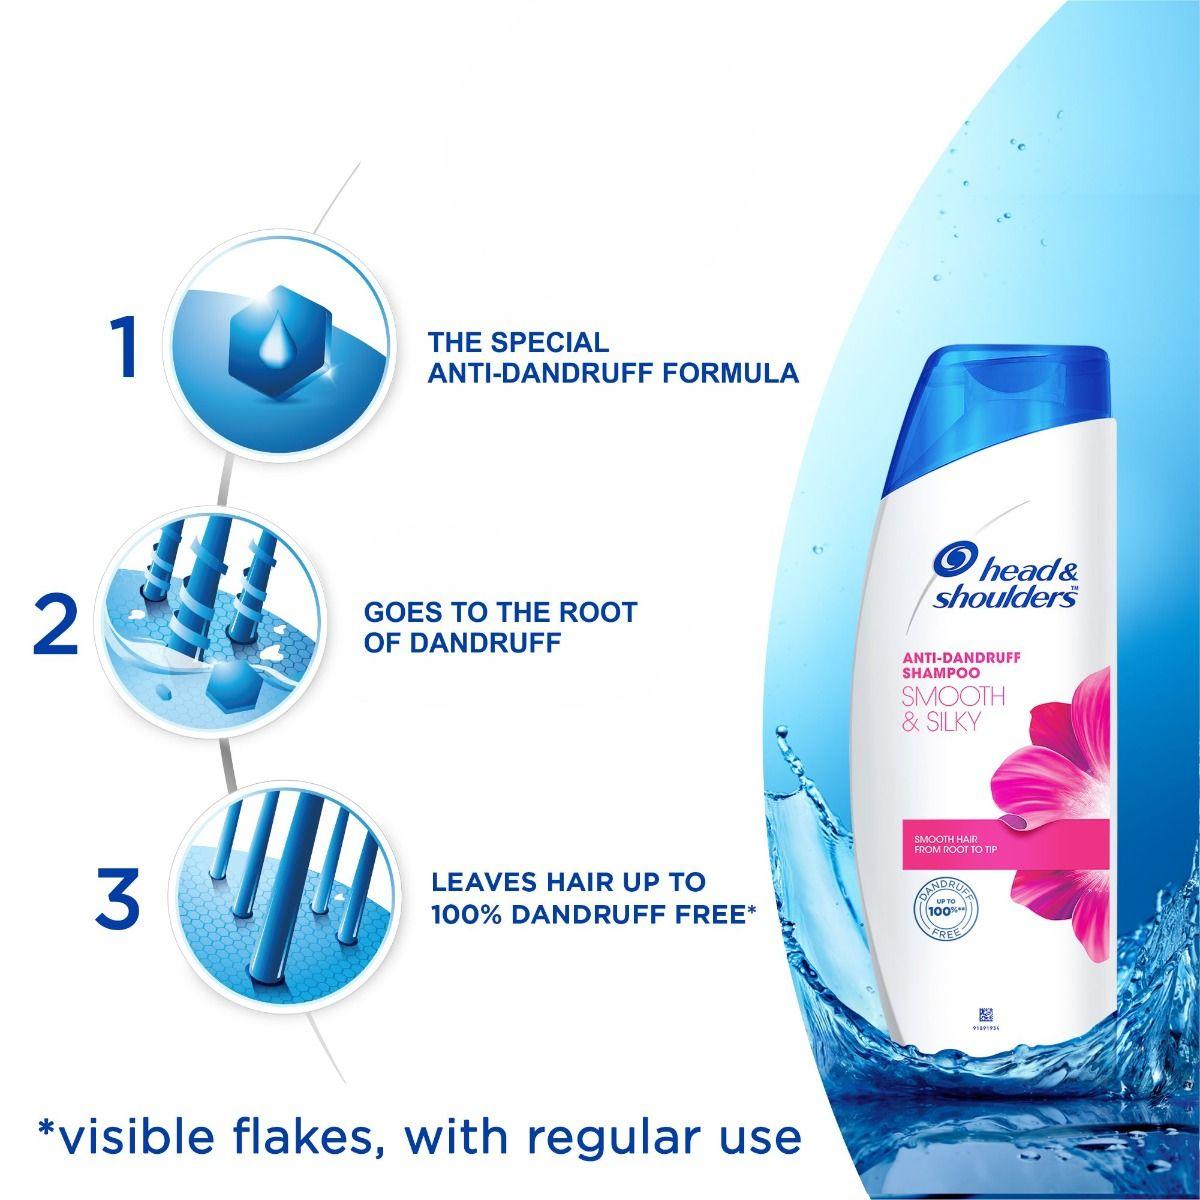 Head & Shoulders Anti-Dandruff Smooth & Silky Shampoo, 72ml, Pack of 1